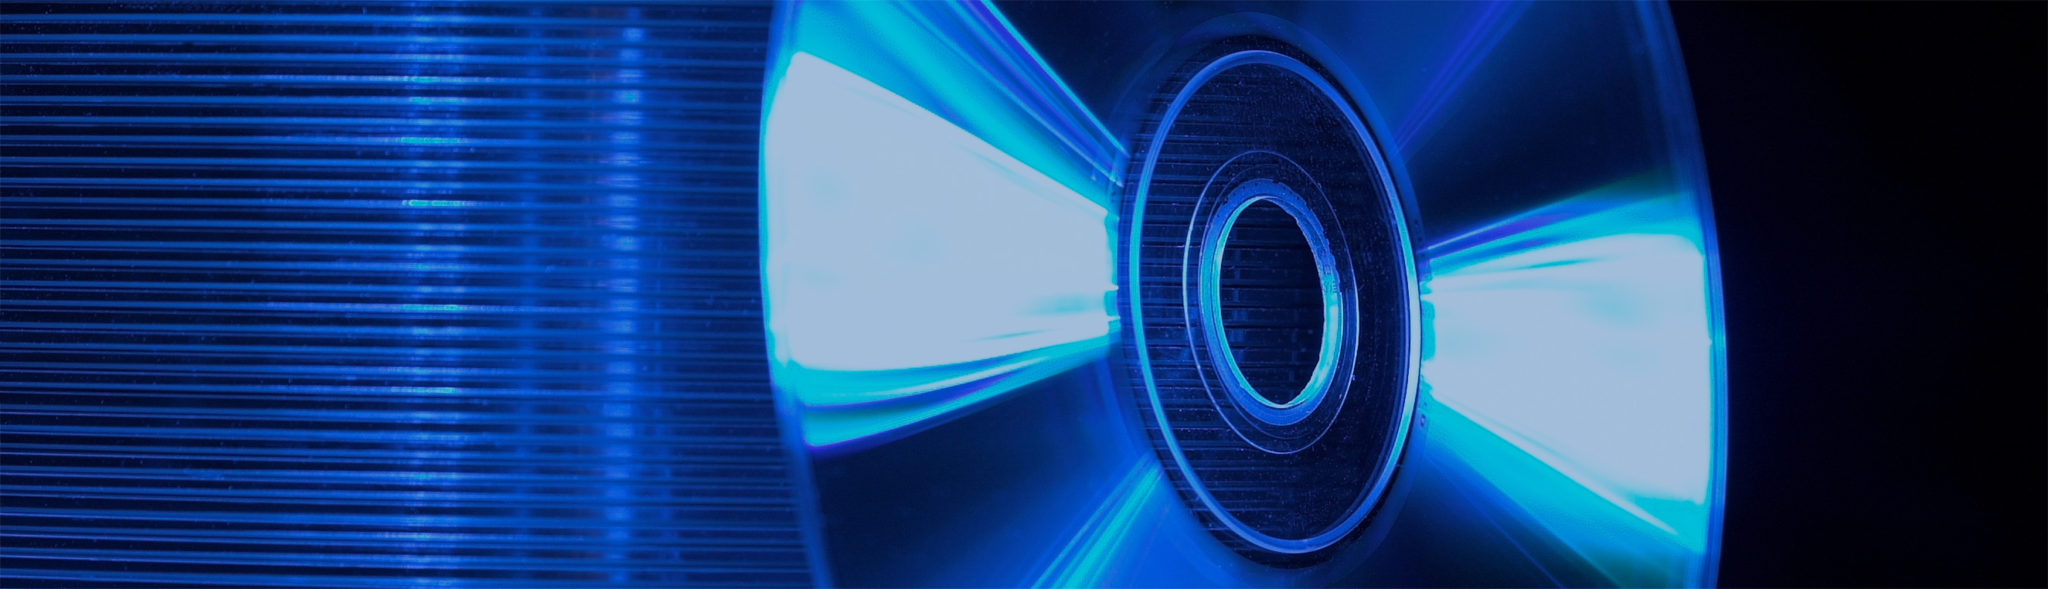 4k ultra hd blu-ray disc initiative | deg